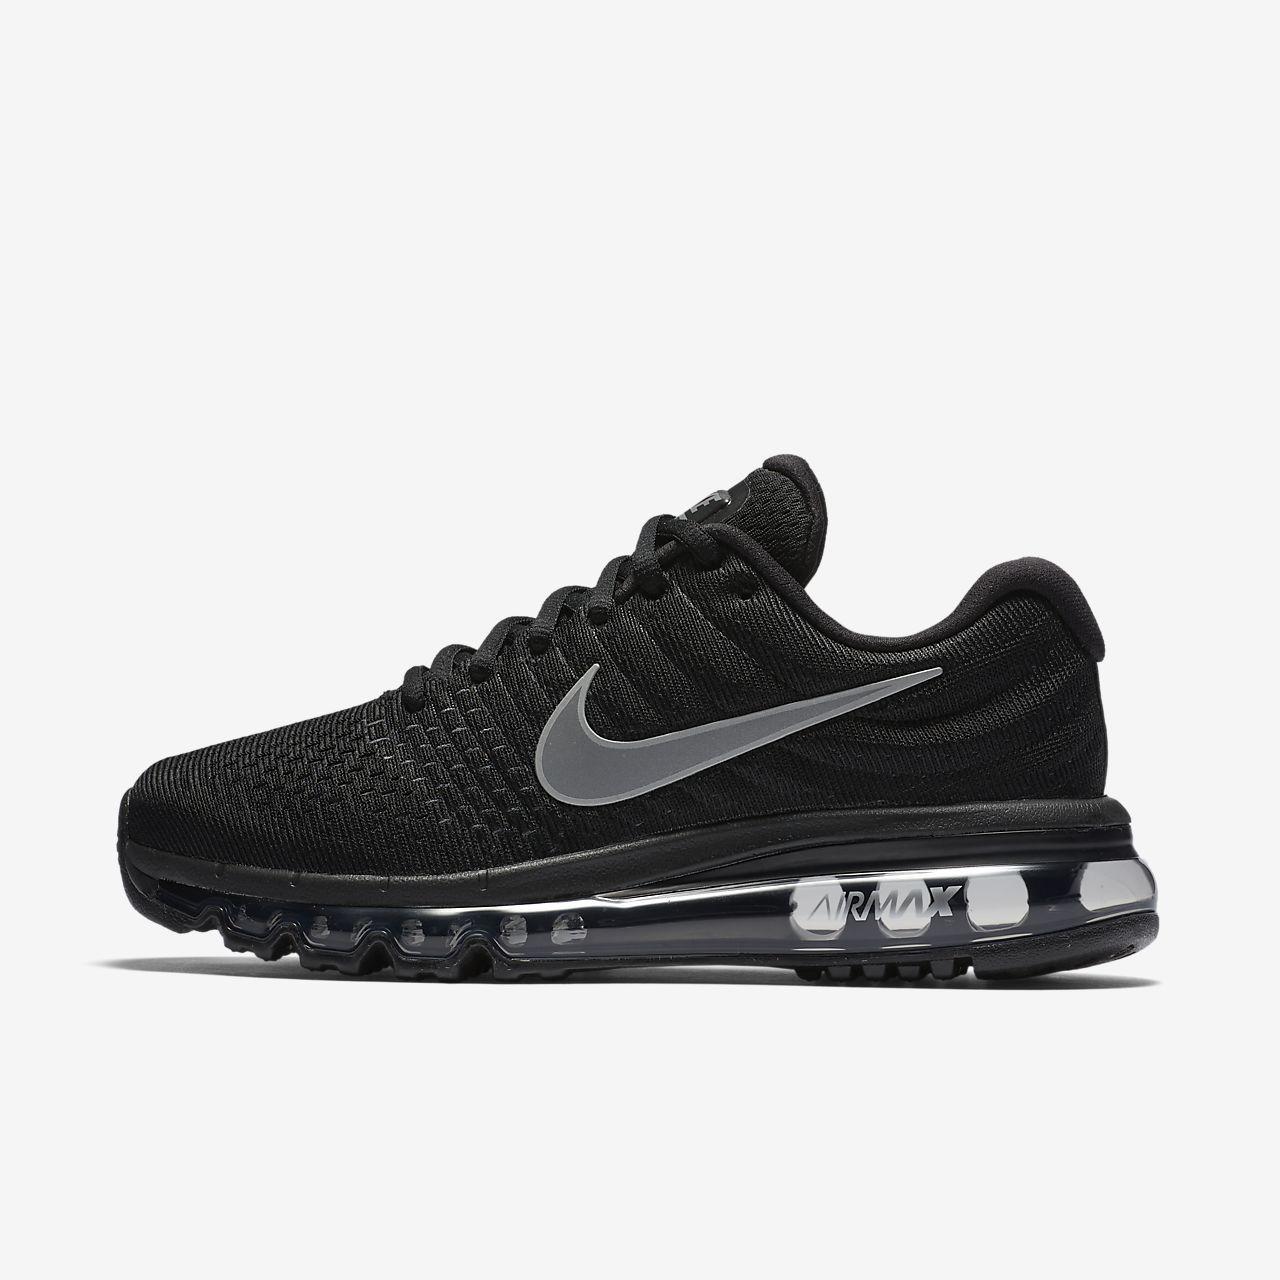 pretty nice 0084f 5c880 Nike Air Max 2017 Damenschuh